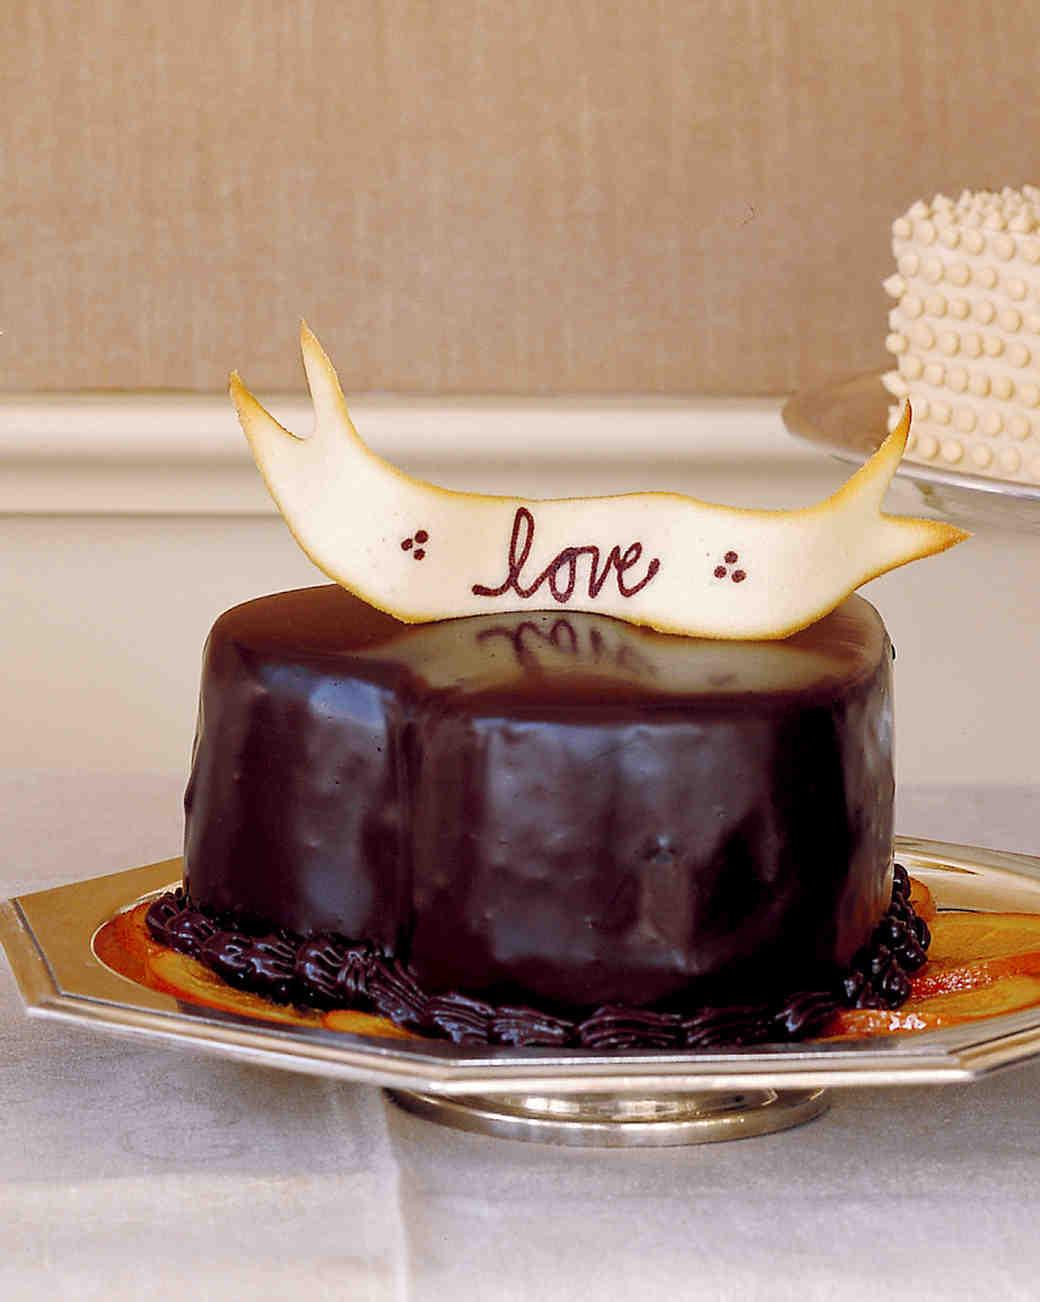 boozy-desserts-diablo-cake-ml952w1-0814.jpg